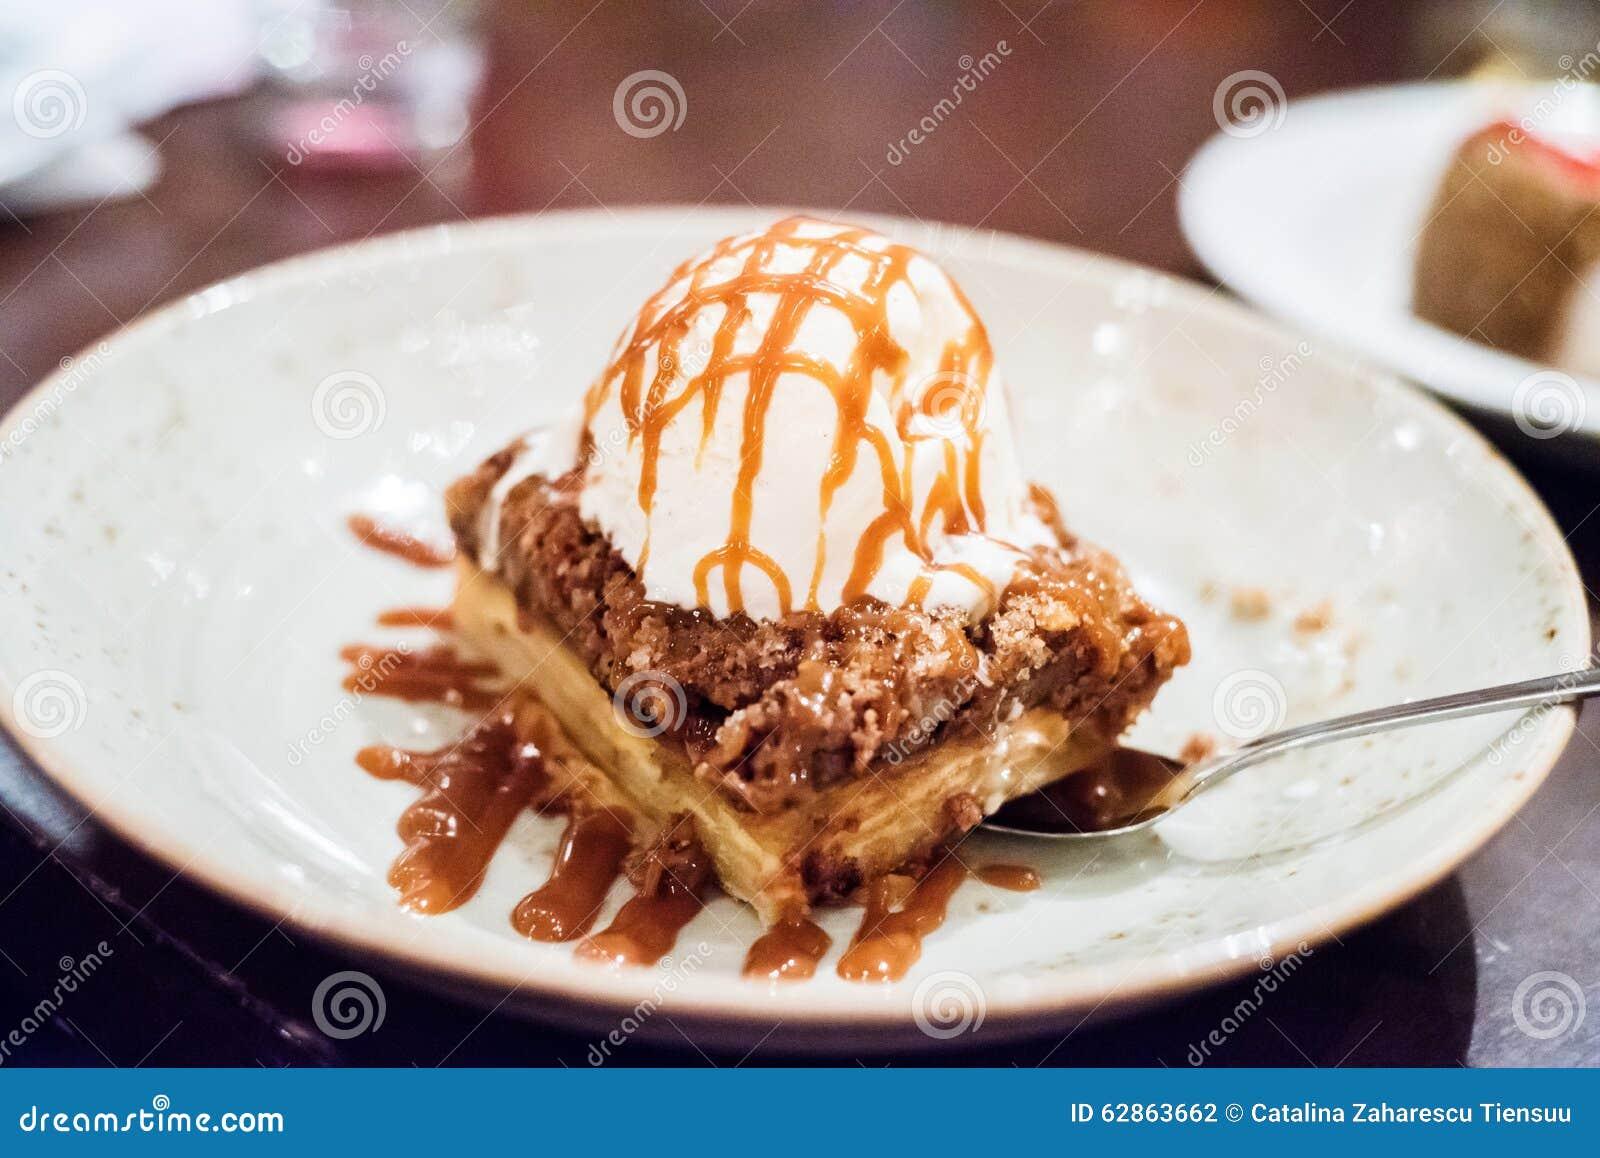 Apple cobbler with vanilla ice cream